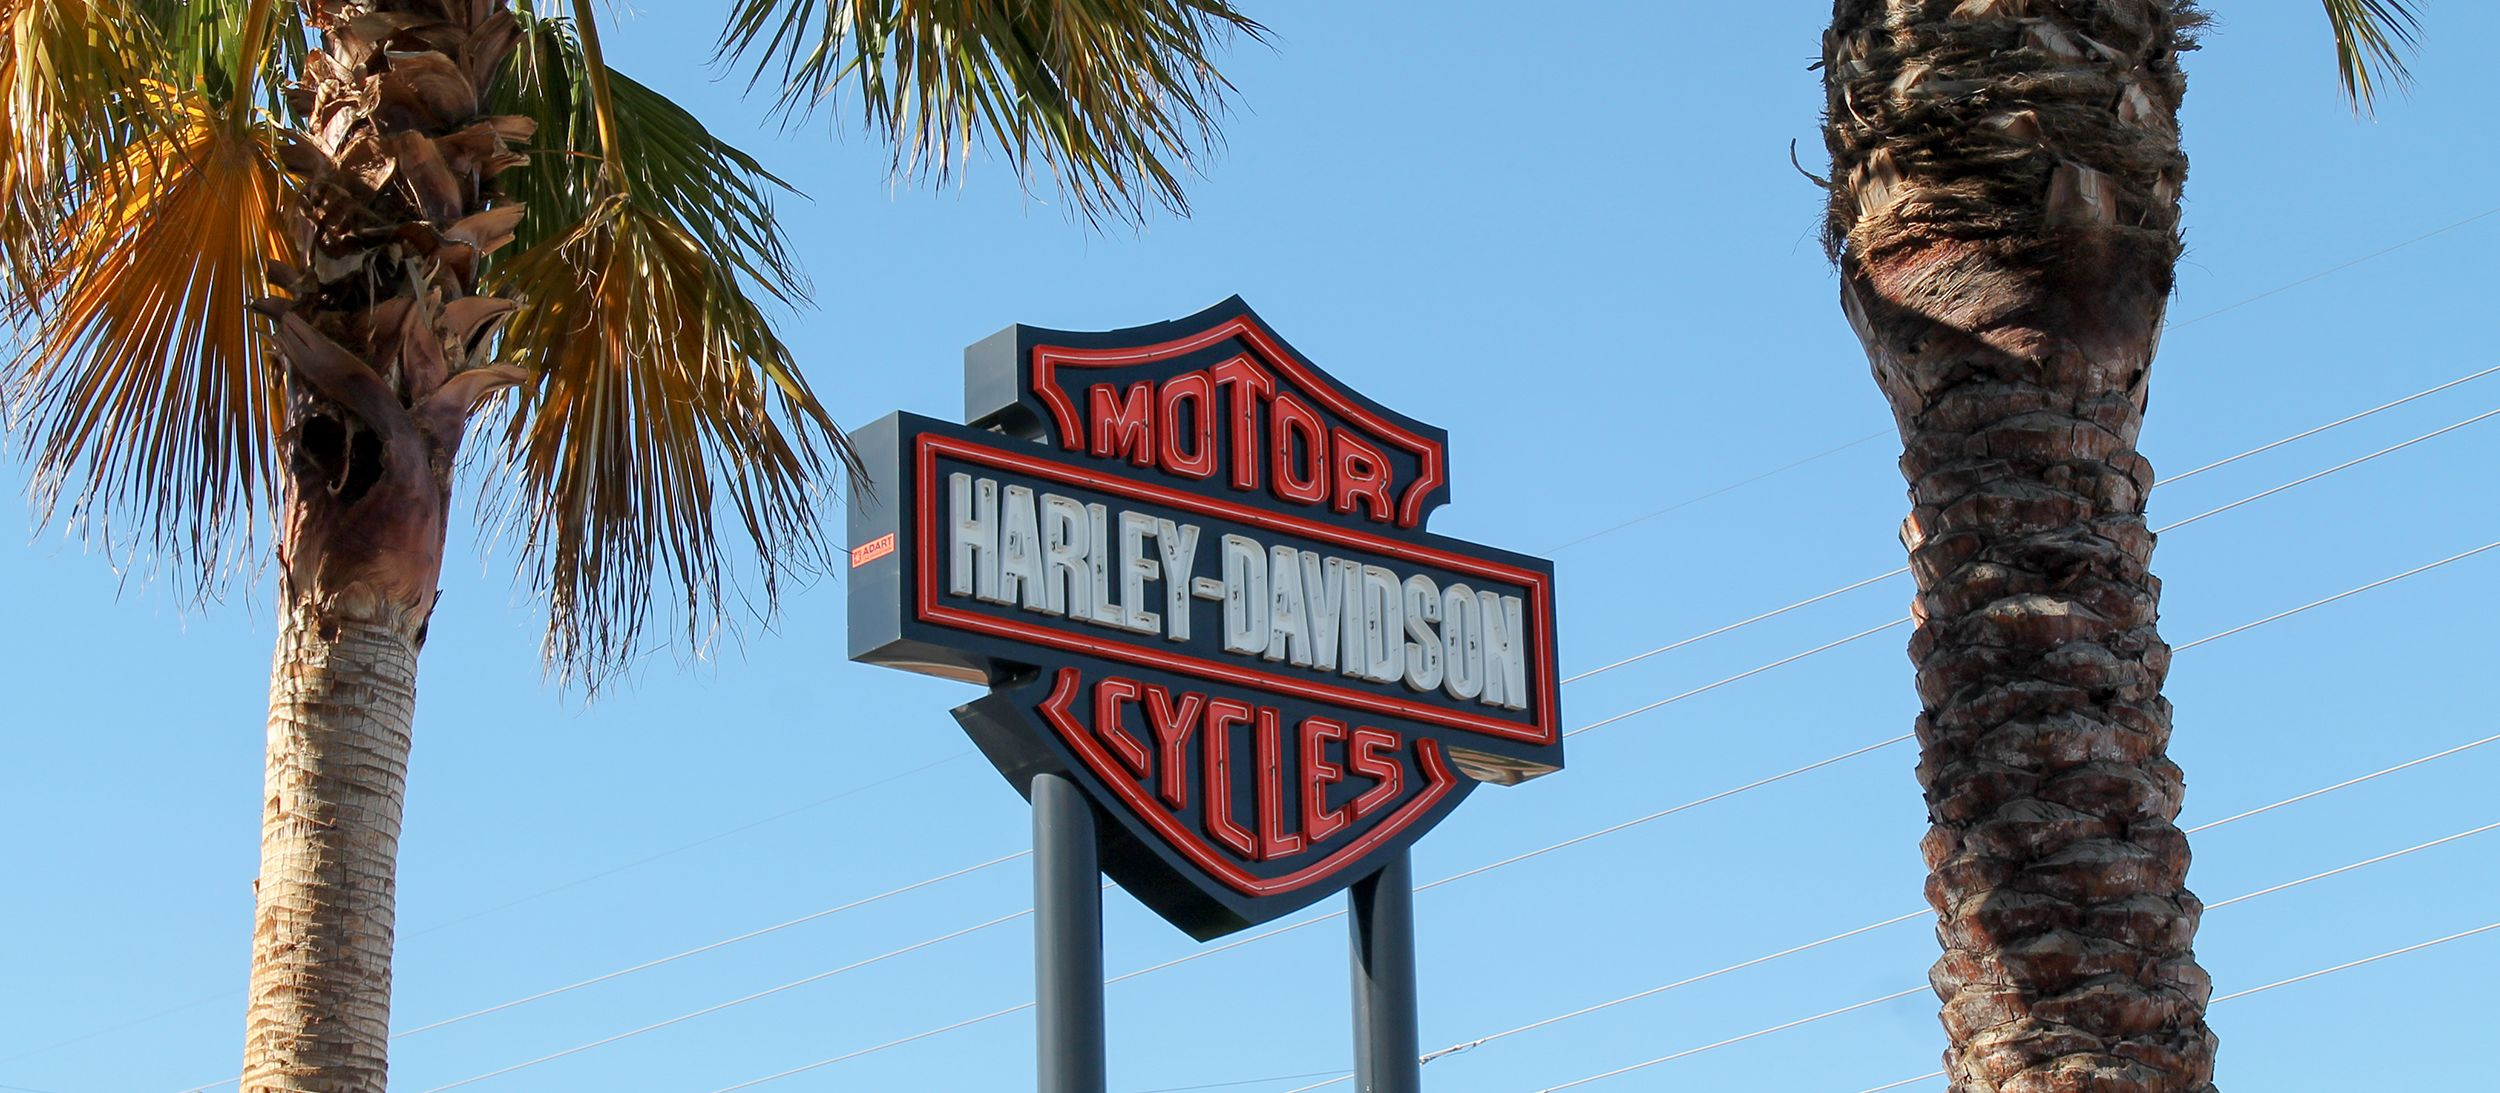 Harley Davidson Logo in Las Vegas